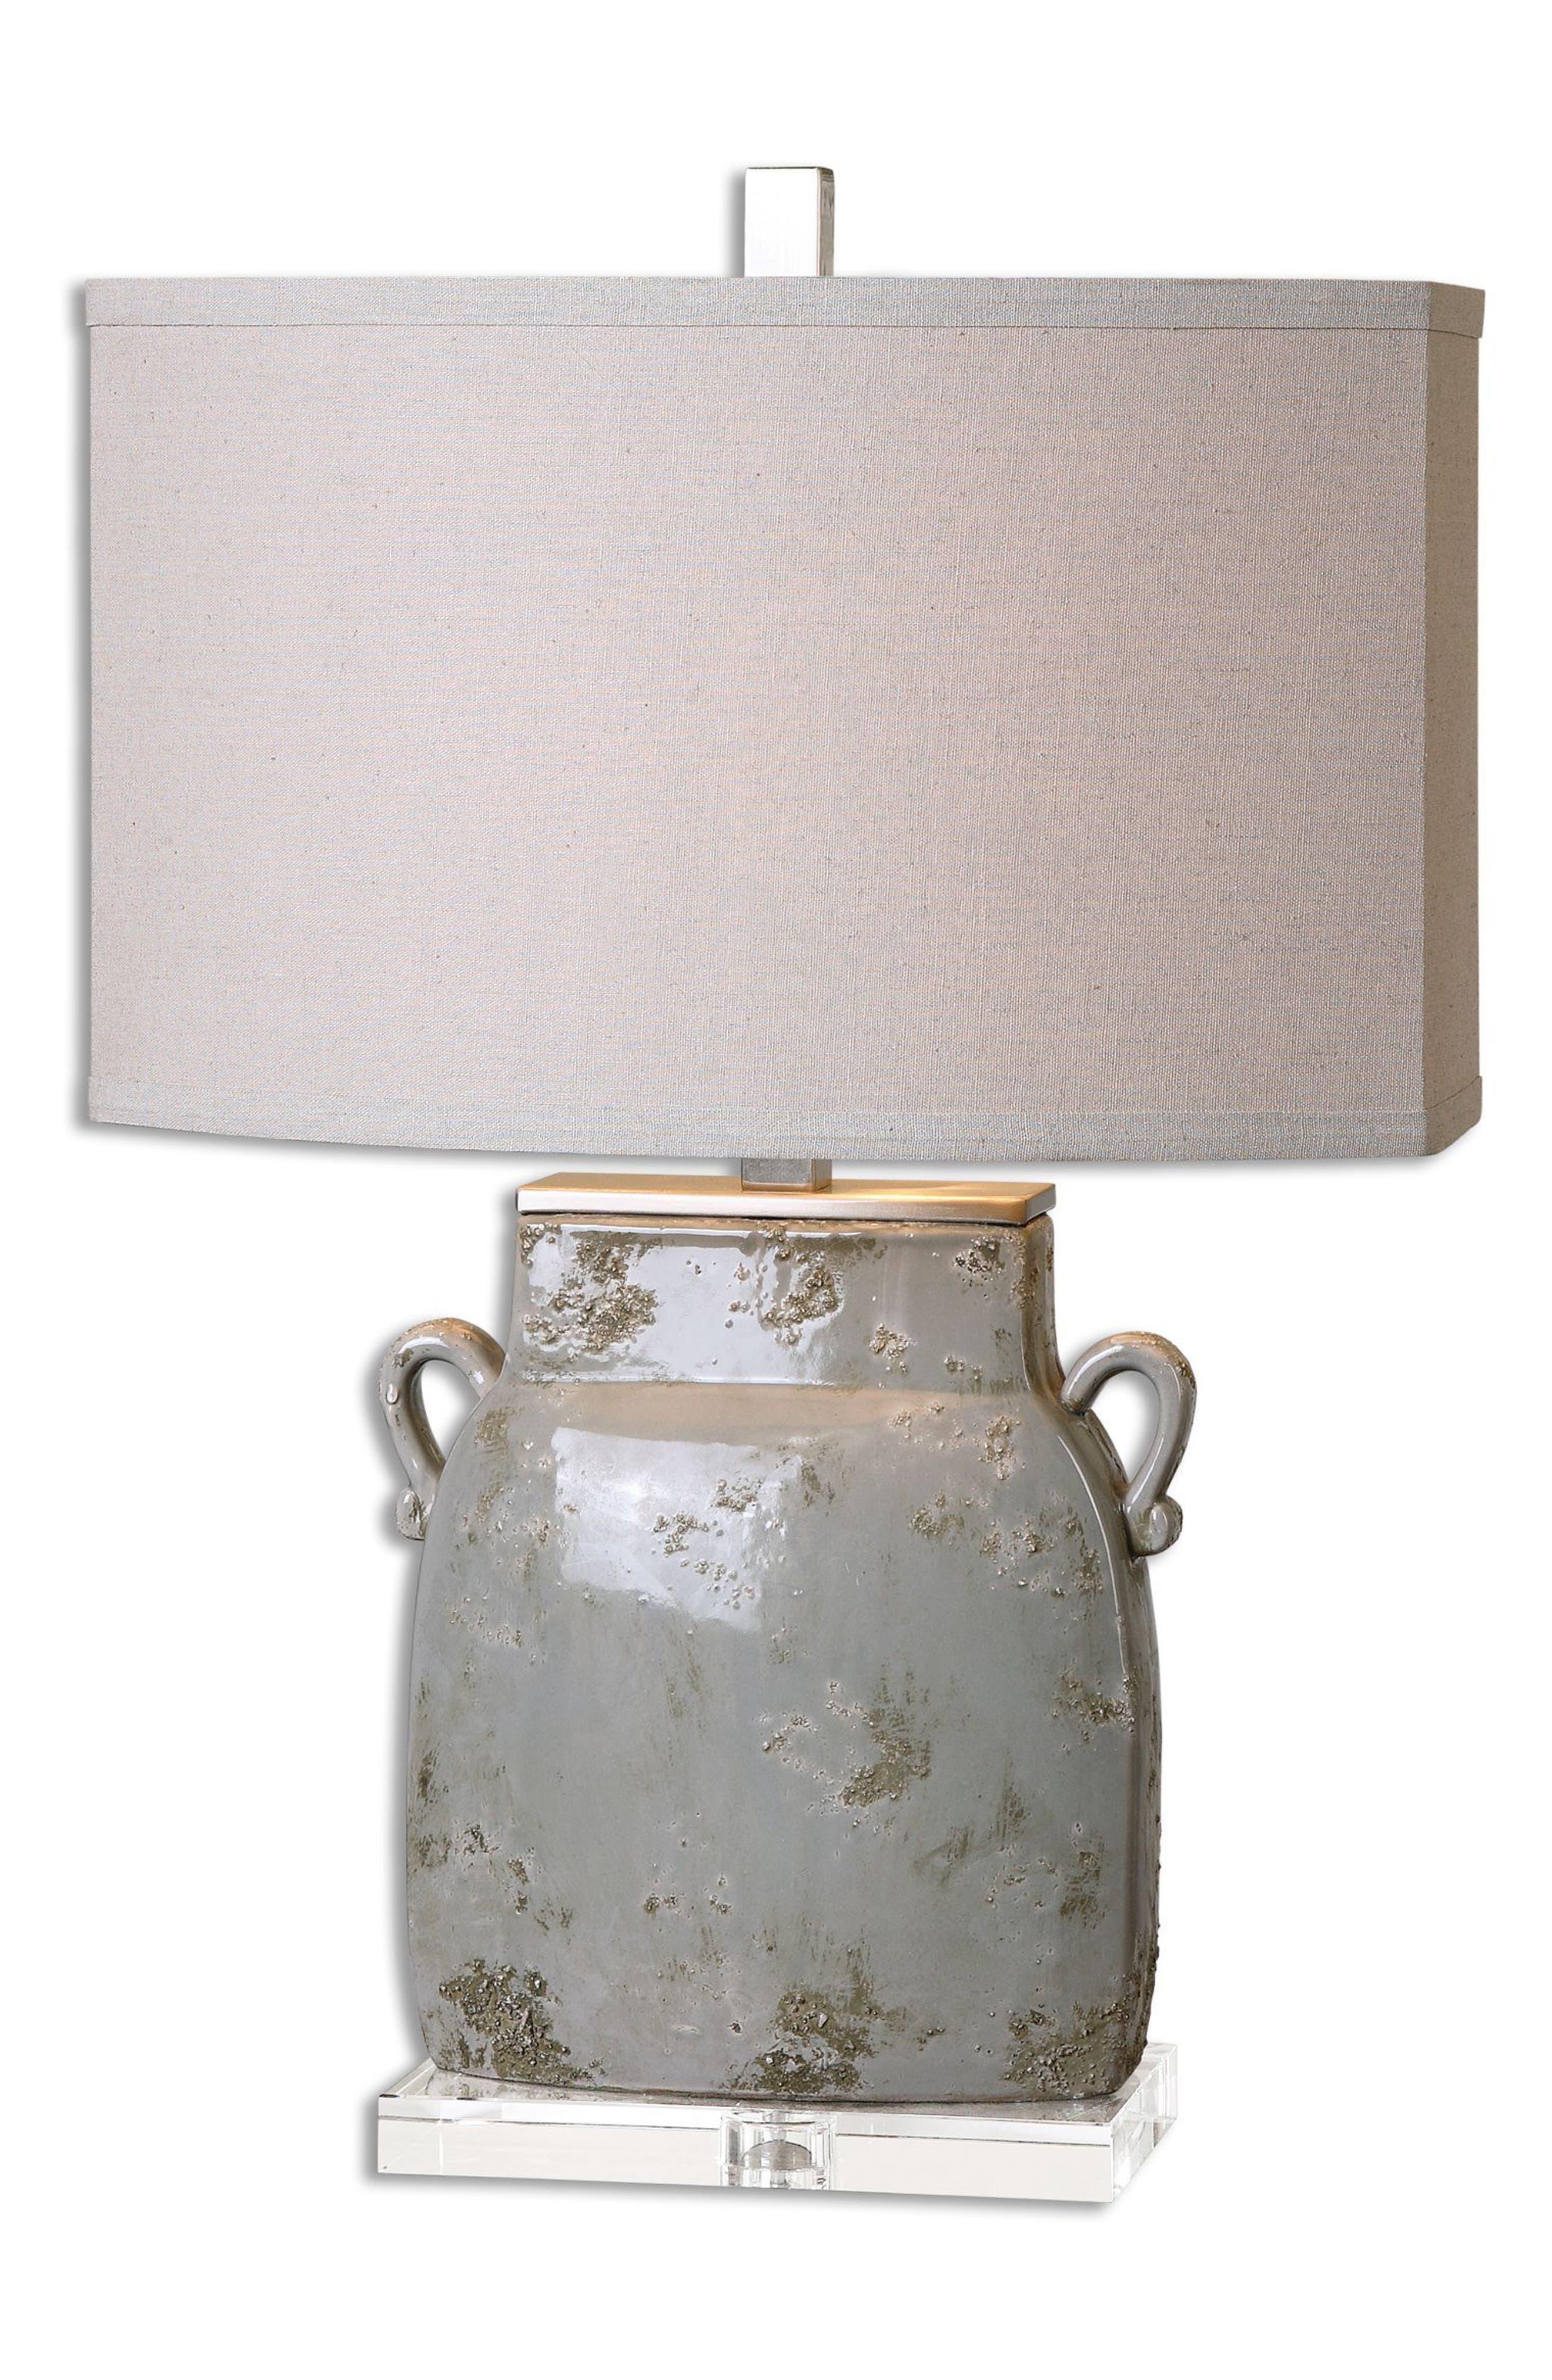 Melizzano Table Lamp,                             Main thumbnail 1, color,                             900